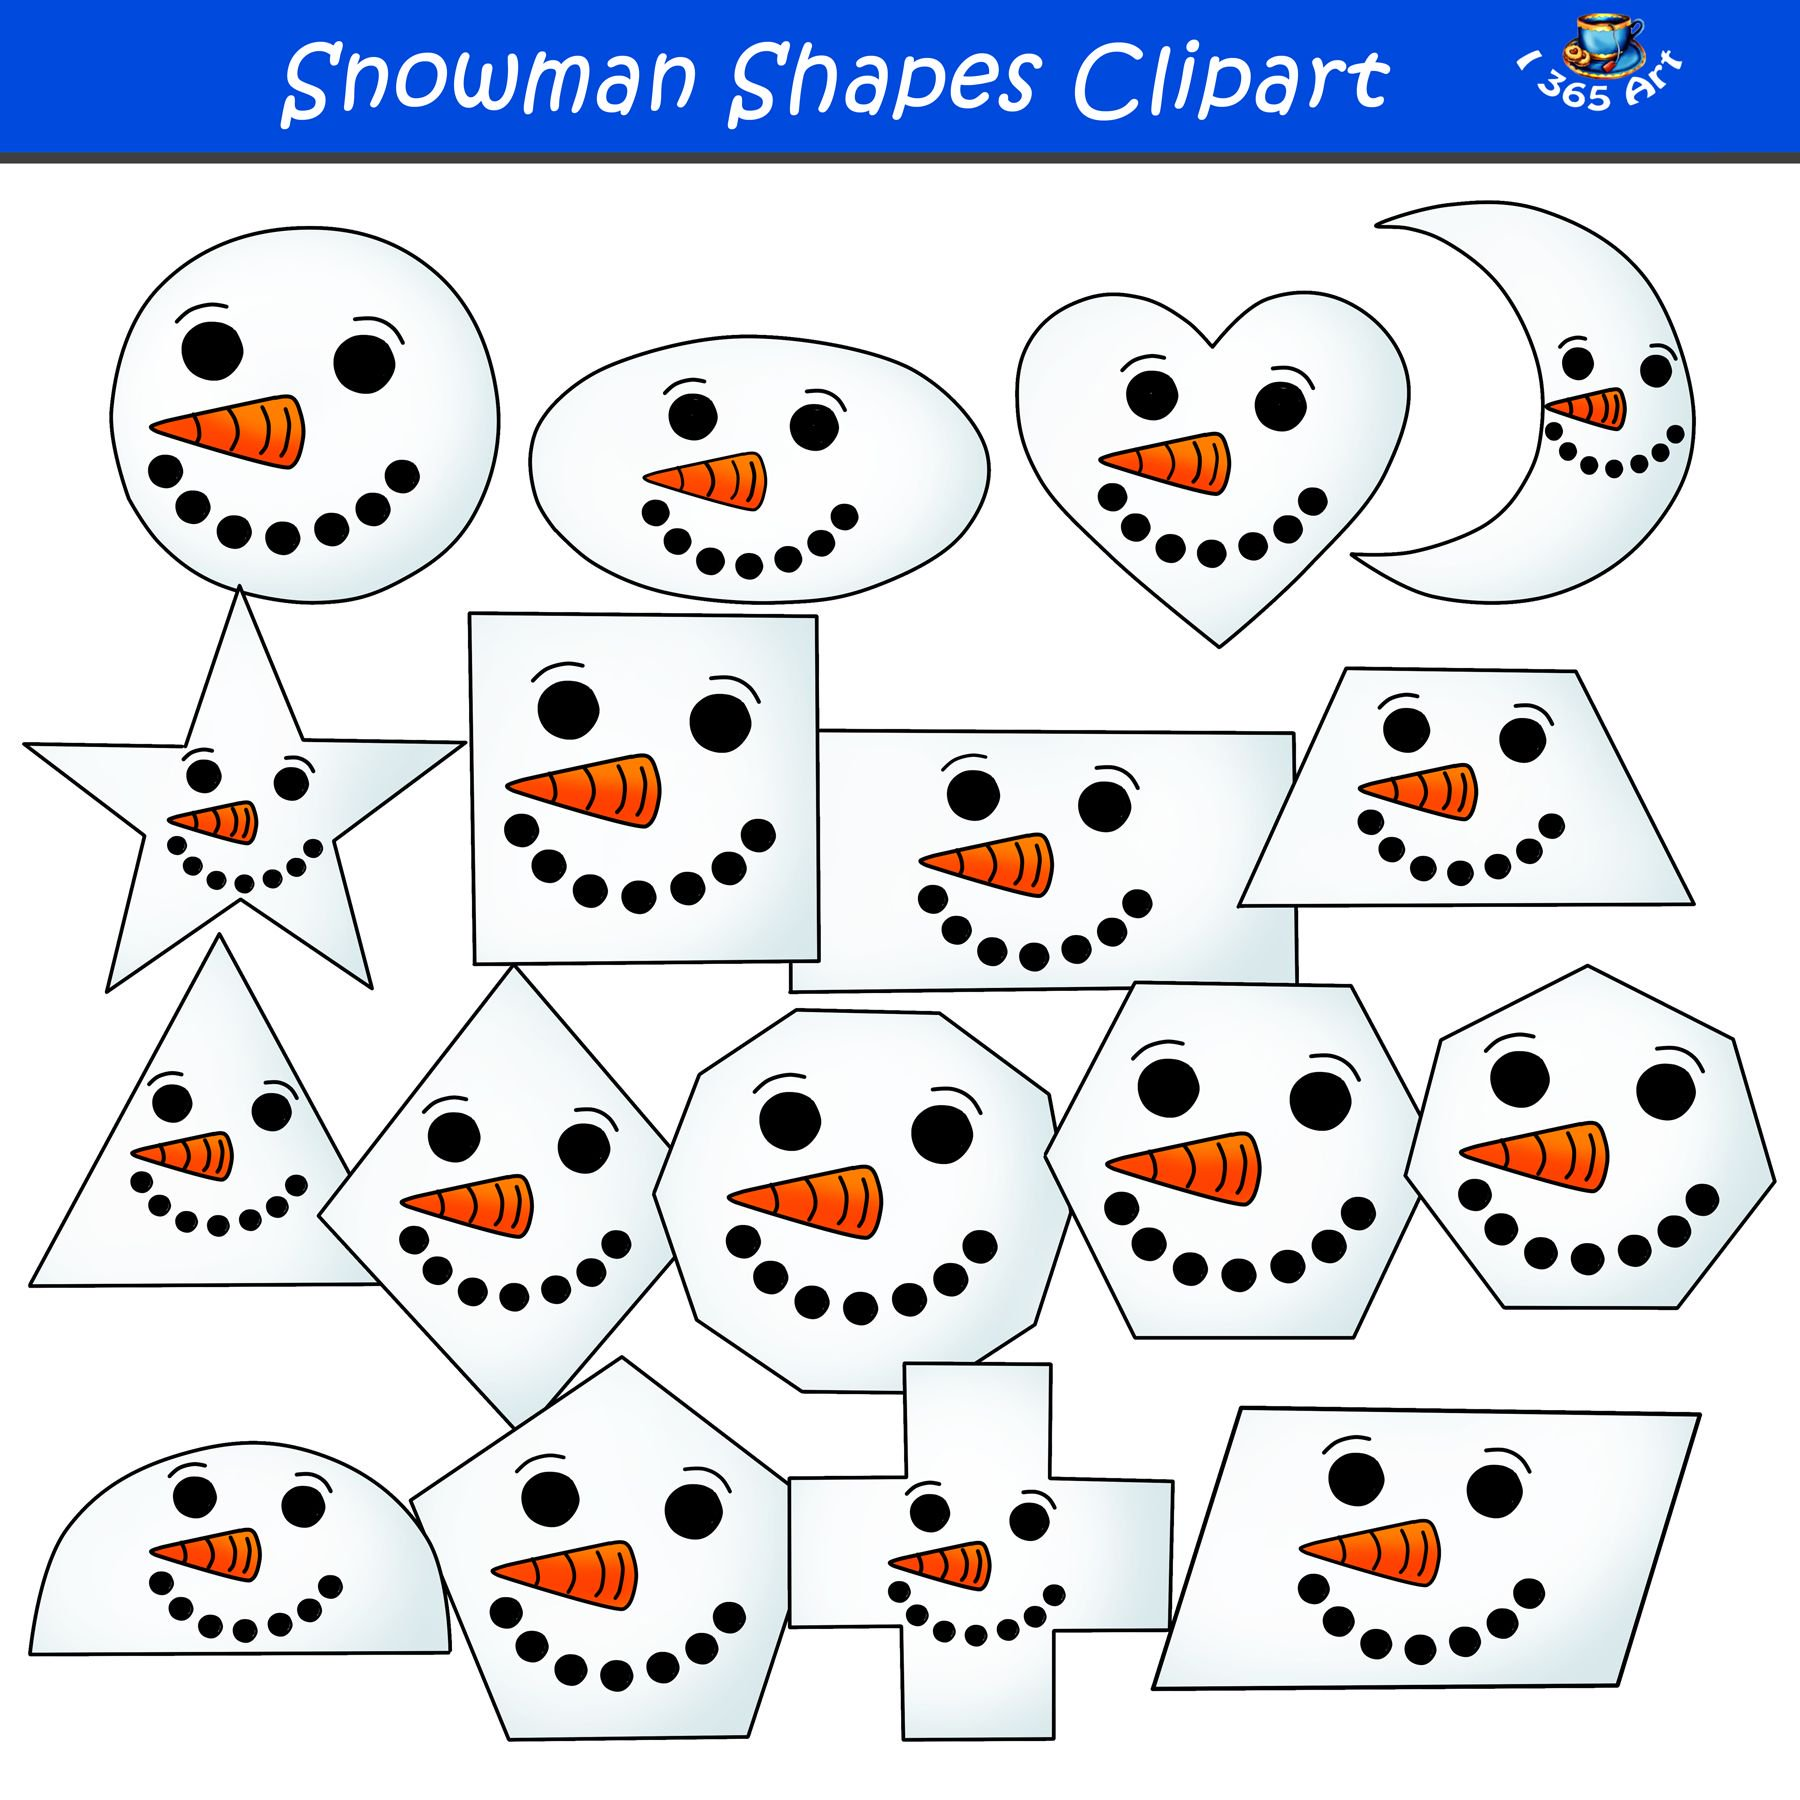 Free To Use Public Domain Snowman Clip Art - Snowman Clipart - 500x500 PNG  Download - PNGkit